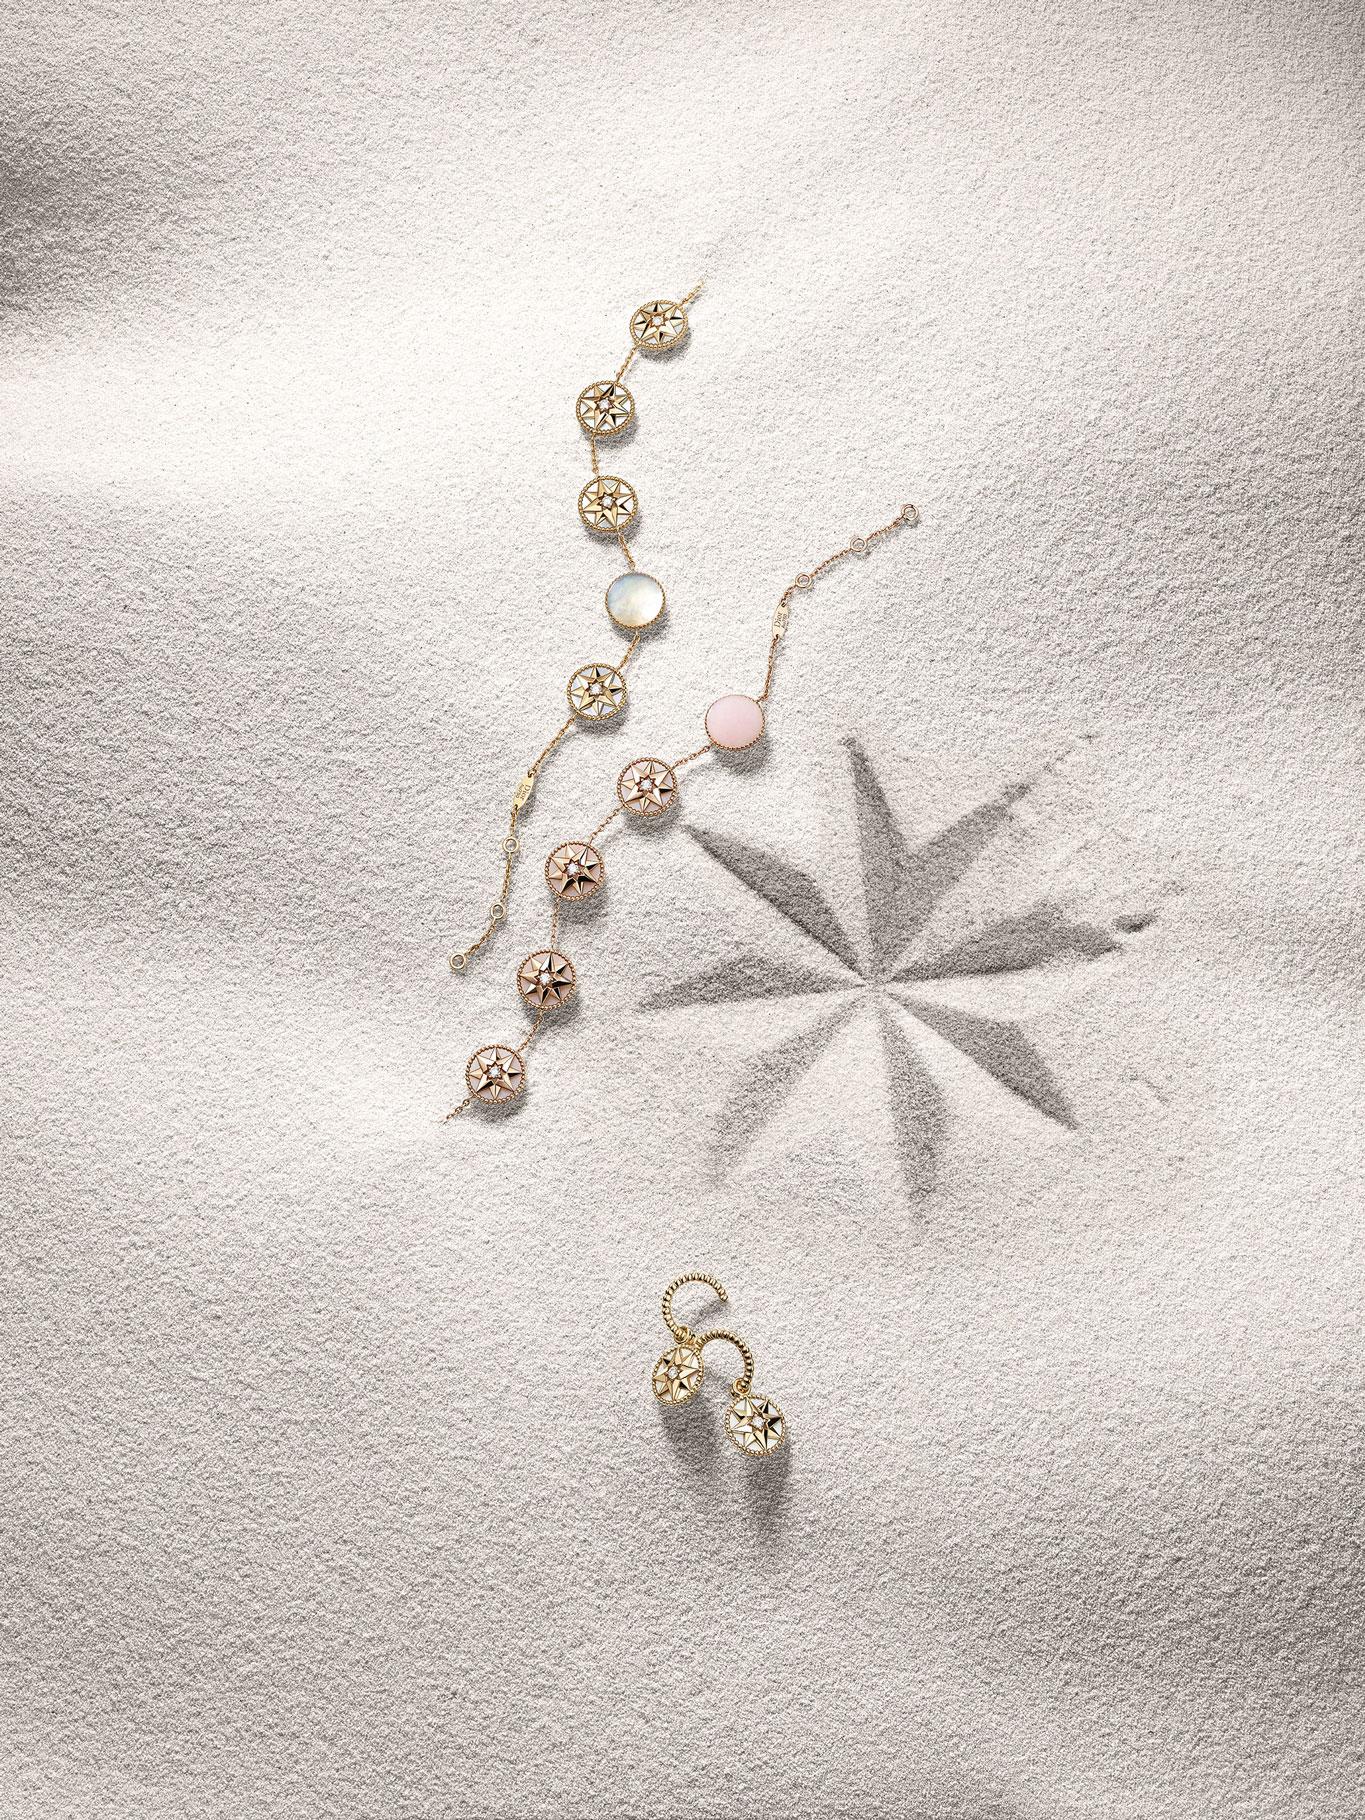 Dior ПОПОЛНЯЕТ КОЛЛЕКЦИЮ Rose des Vents